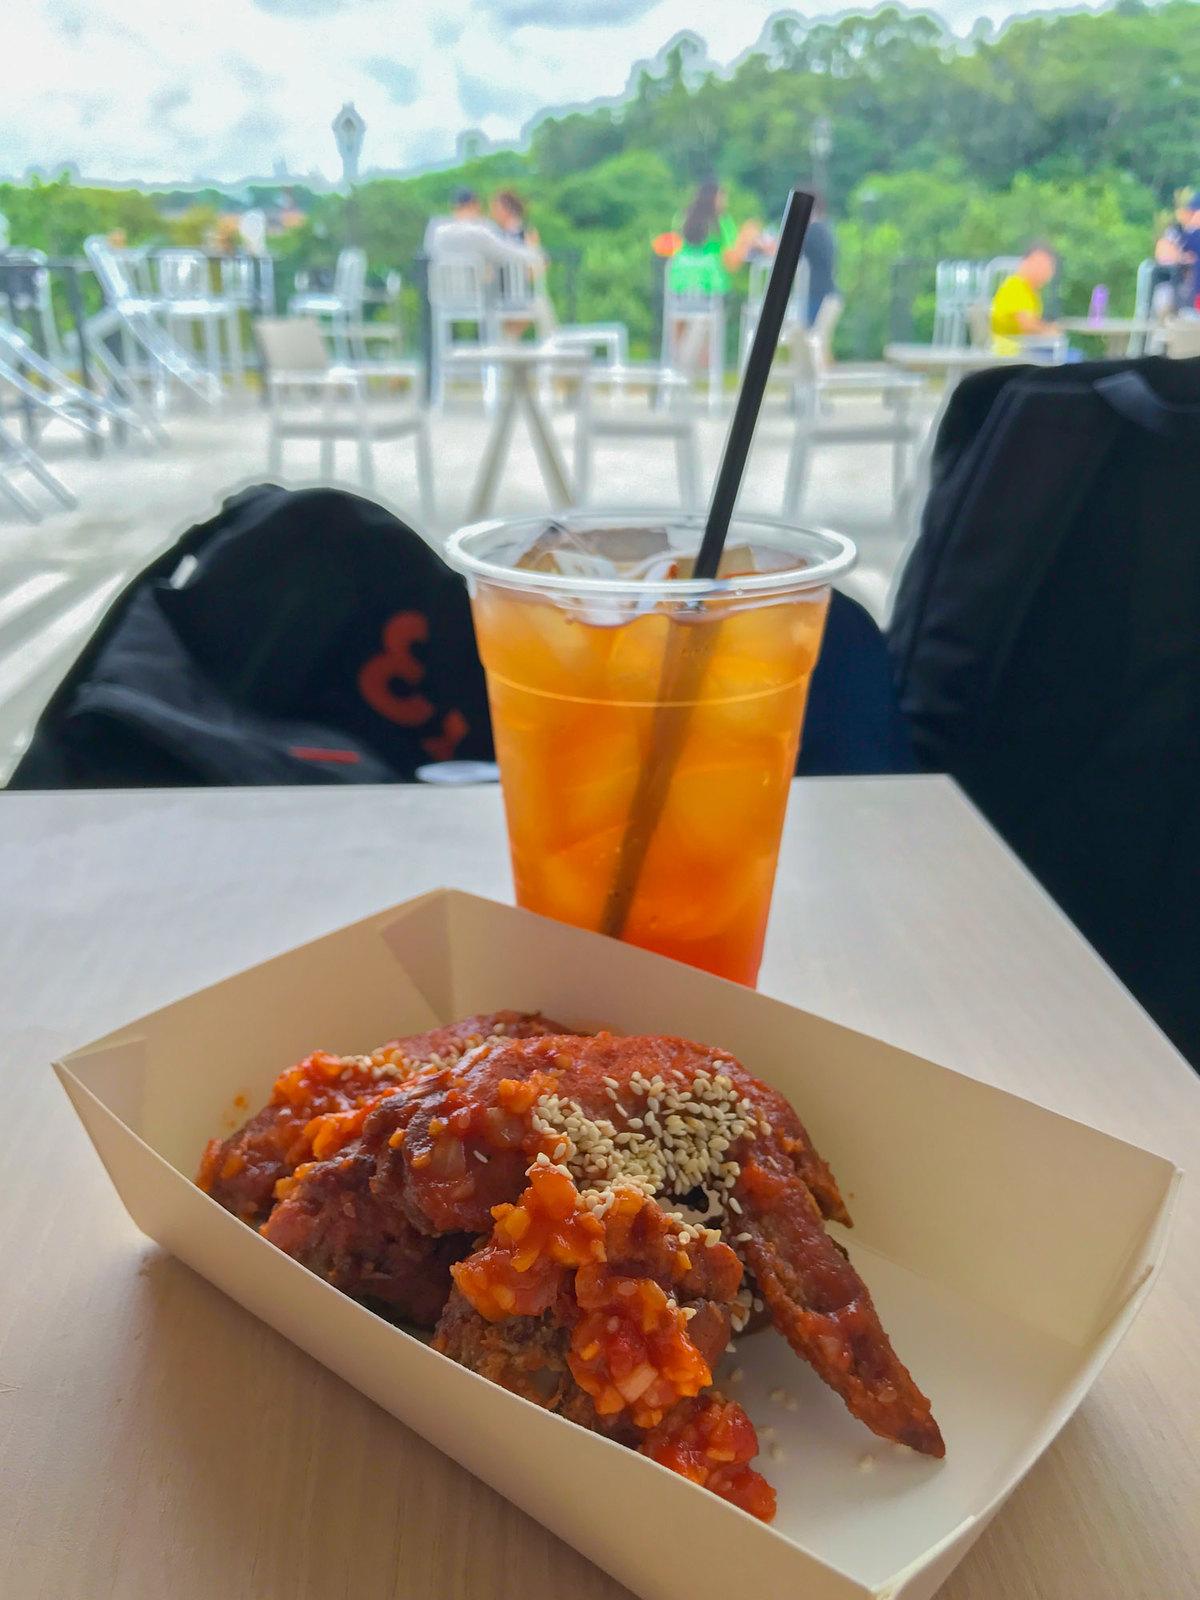 punggol-container-eateries-darrenbloggie-7